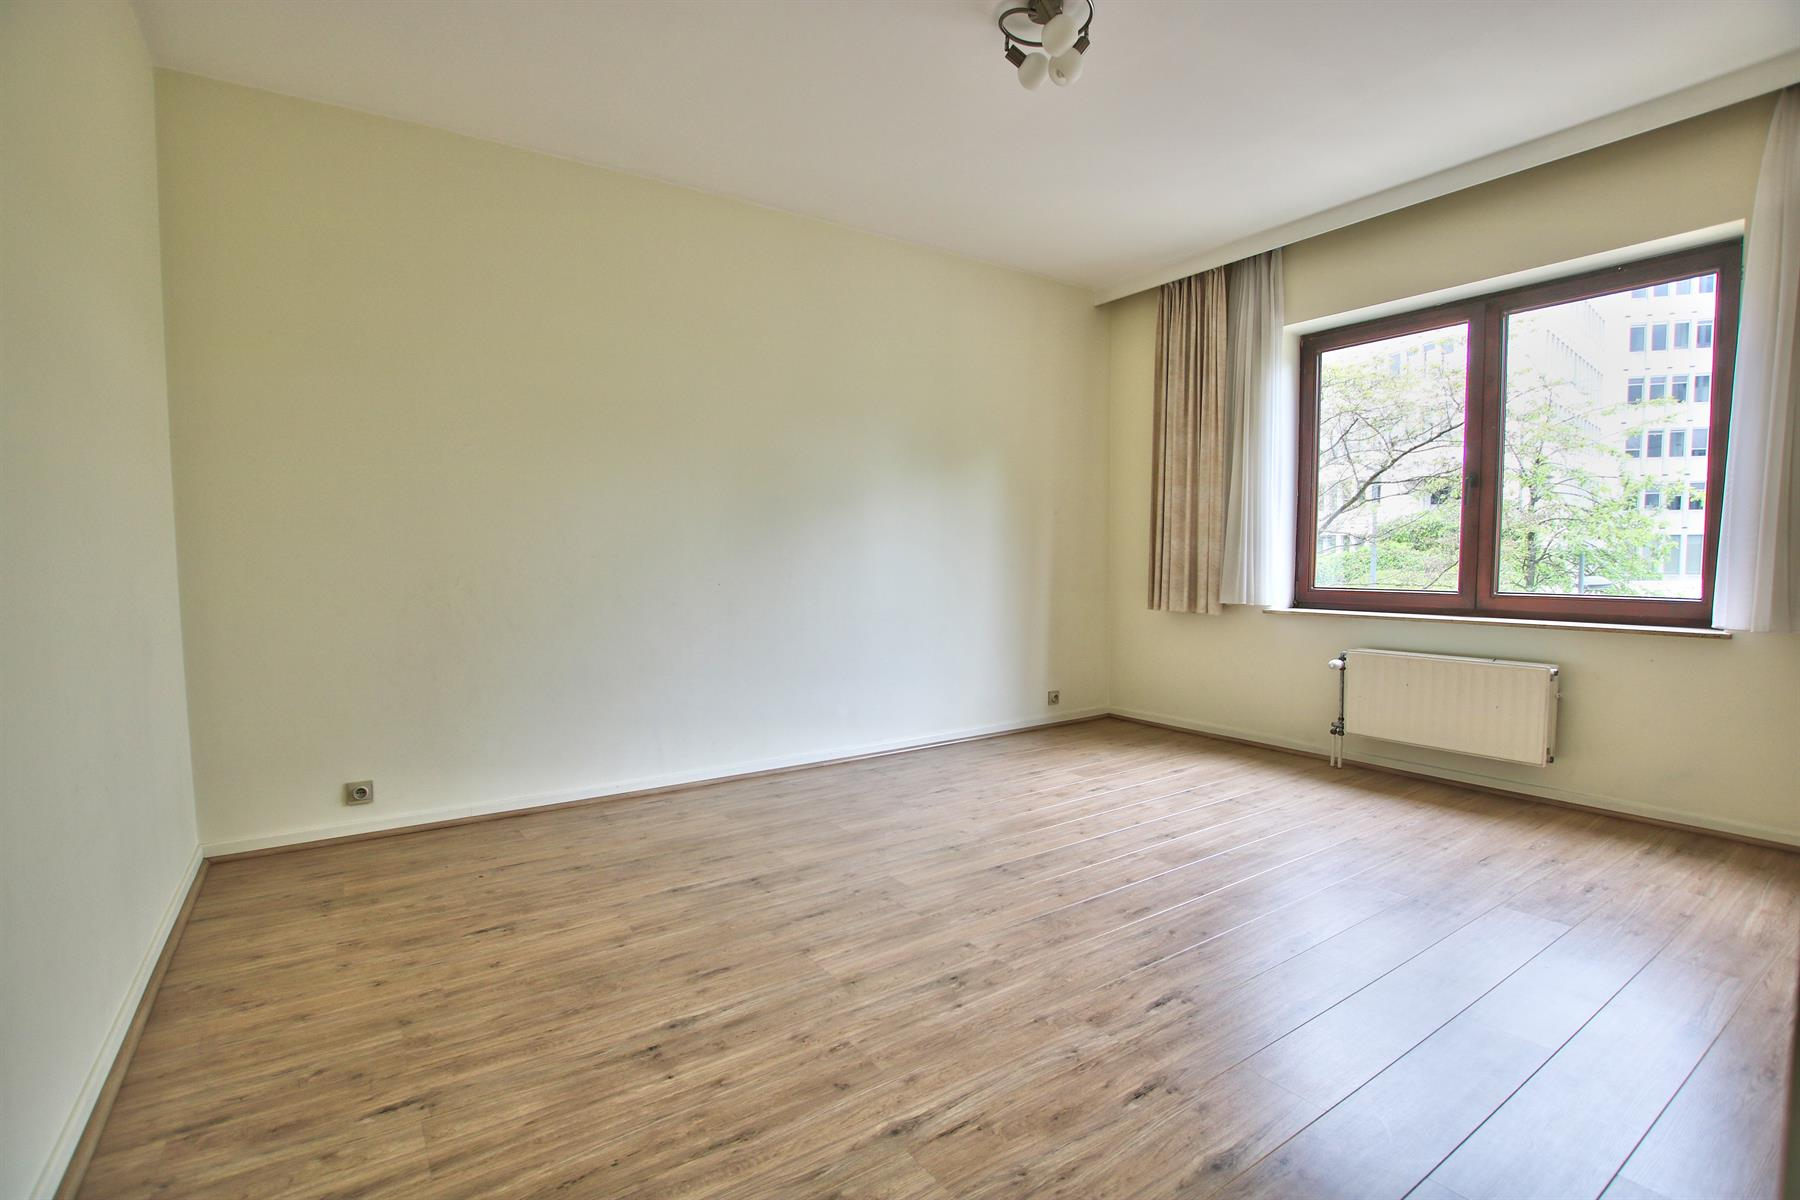 Appartement - Auderghem - #4517295-6